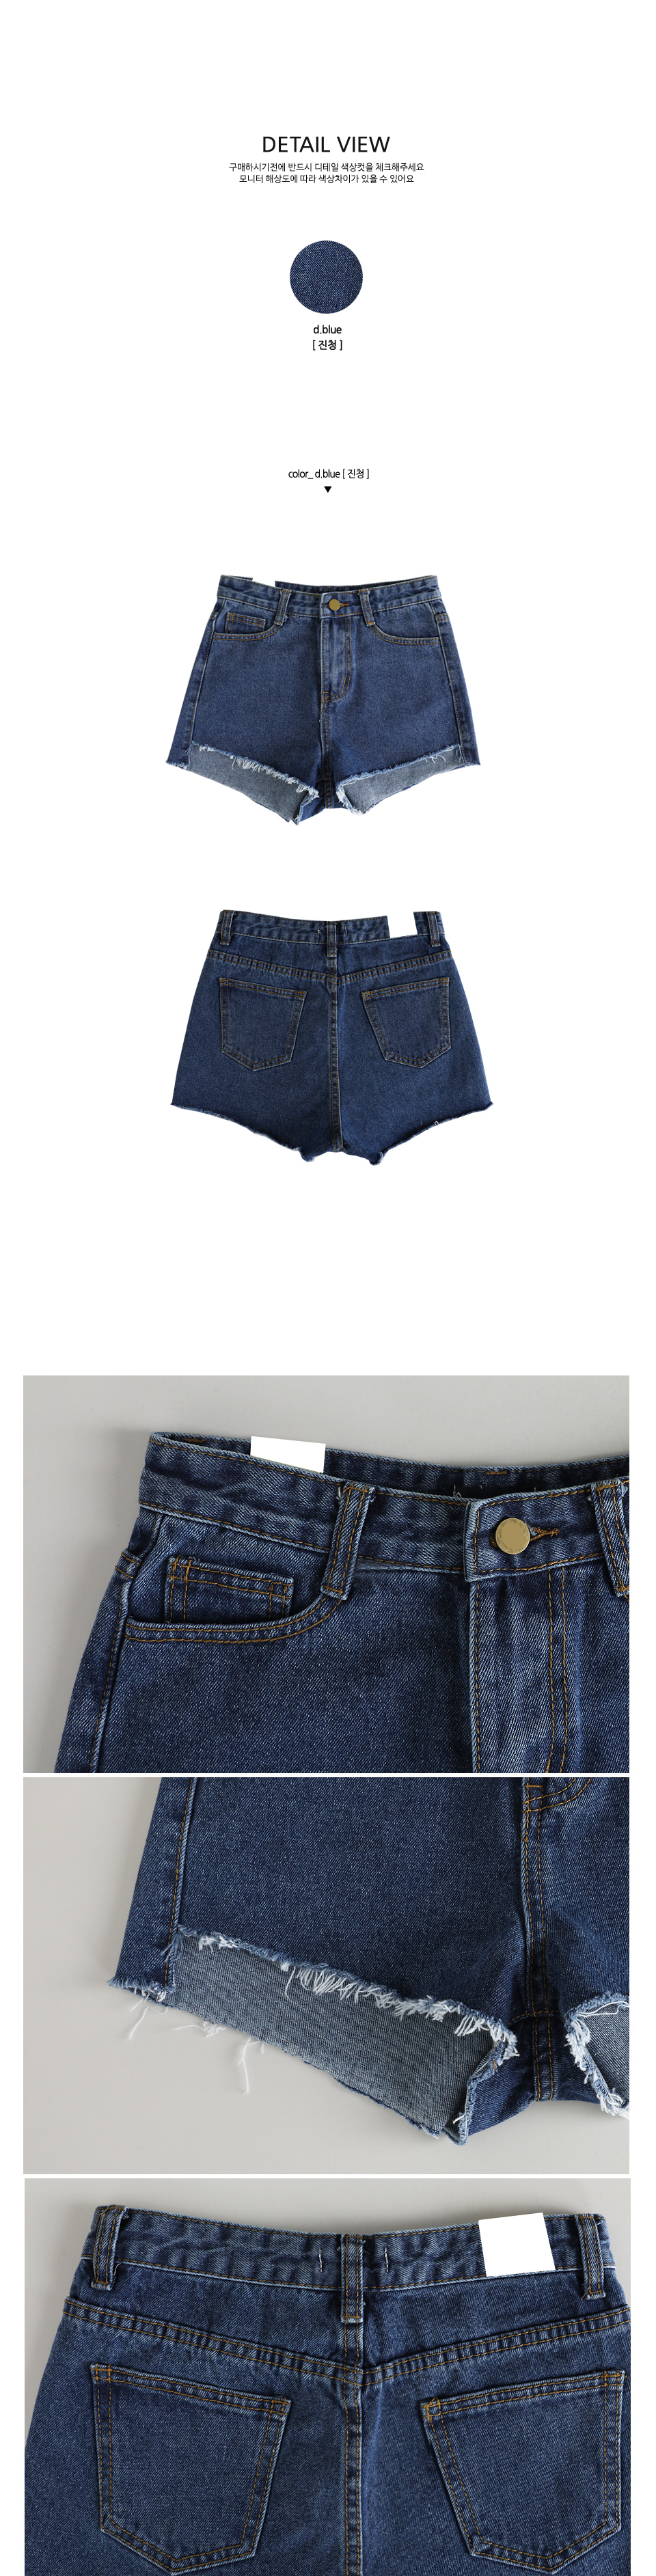 Ken Unknown's hot pants